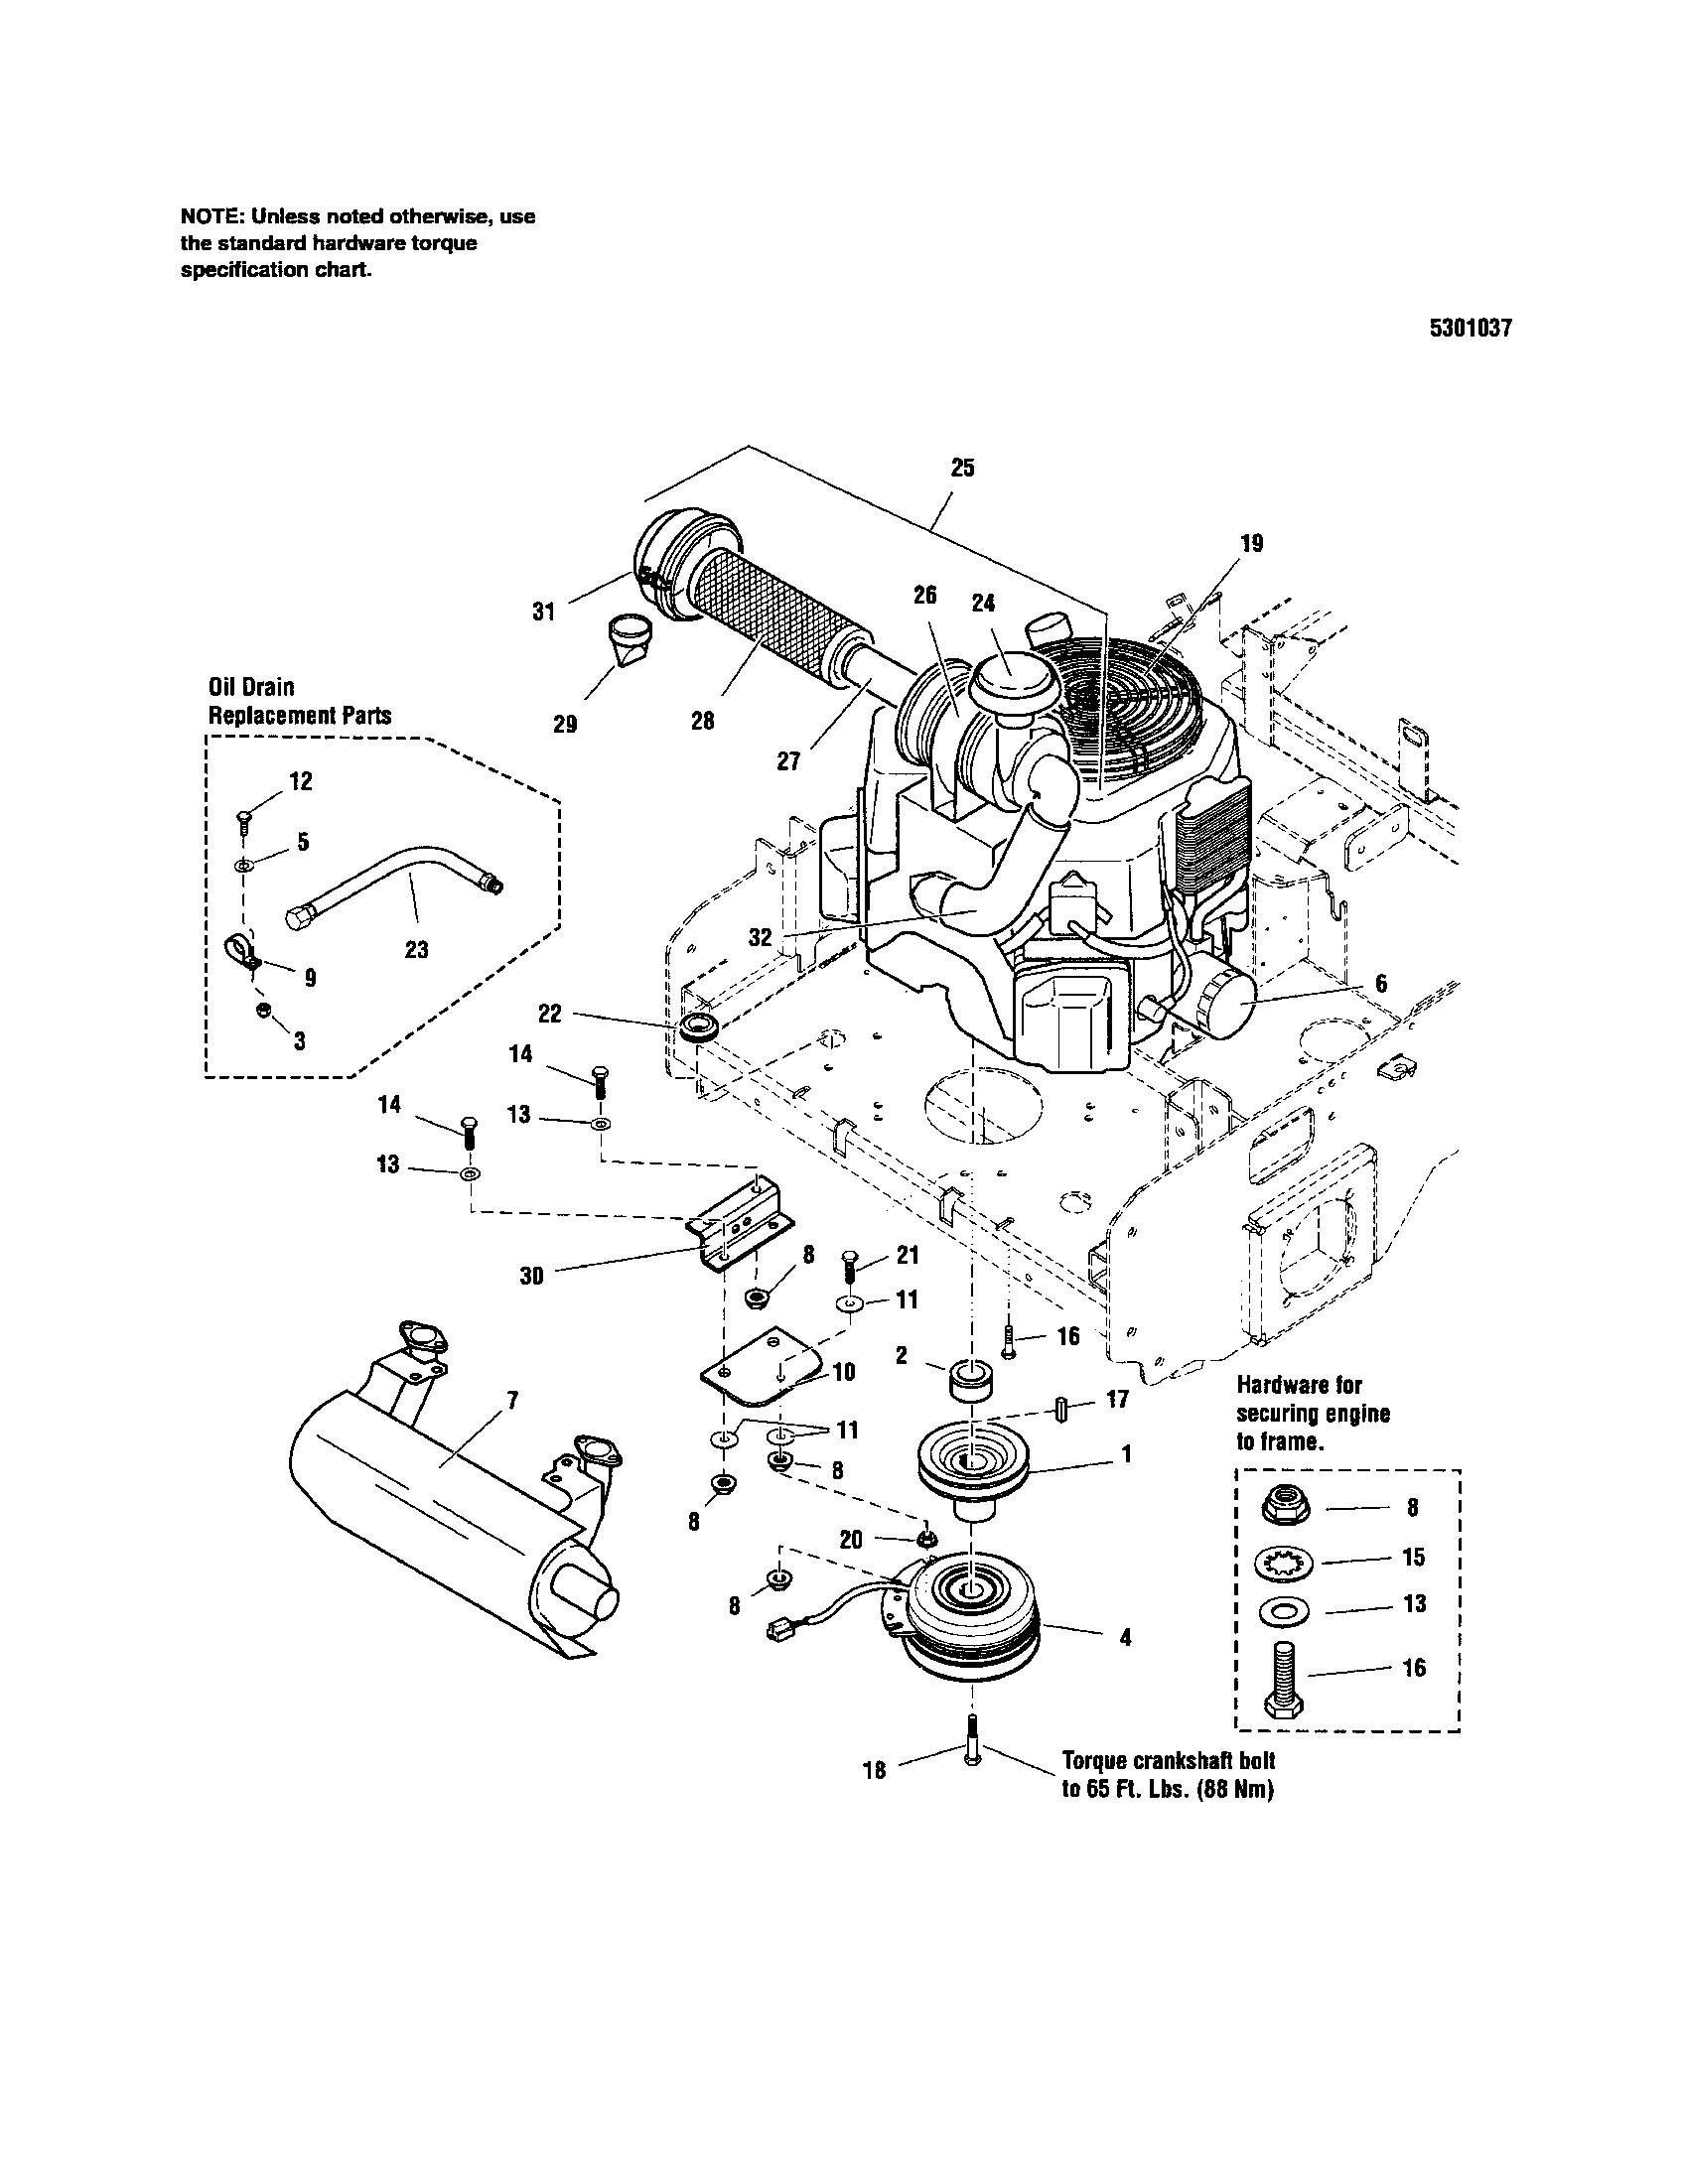 kohler mand 26 hp engine diagram 1 4 malawi24 de Kohler Wiring Diagram Manual kohler engine diagram 12 5 mand online wiring diagram rh 3 kaspars co kohler mand 25